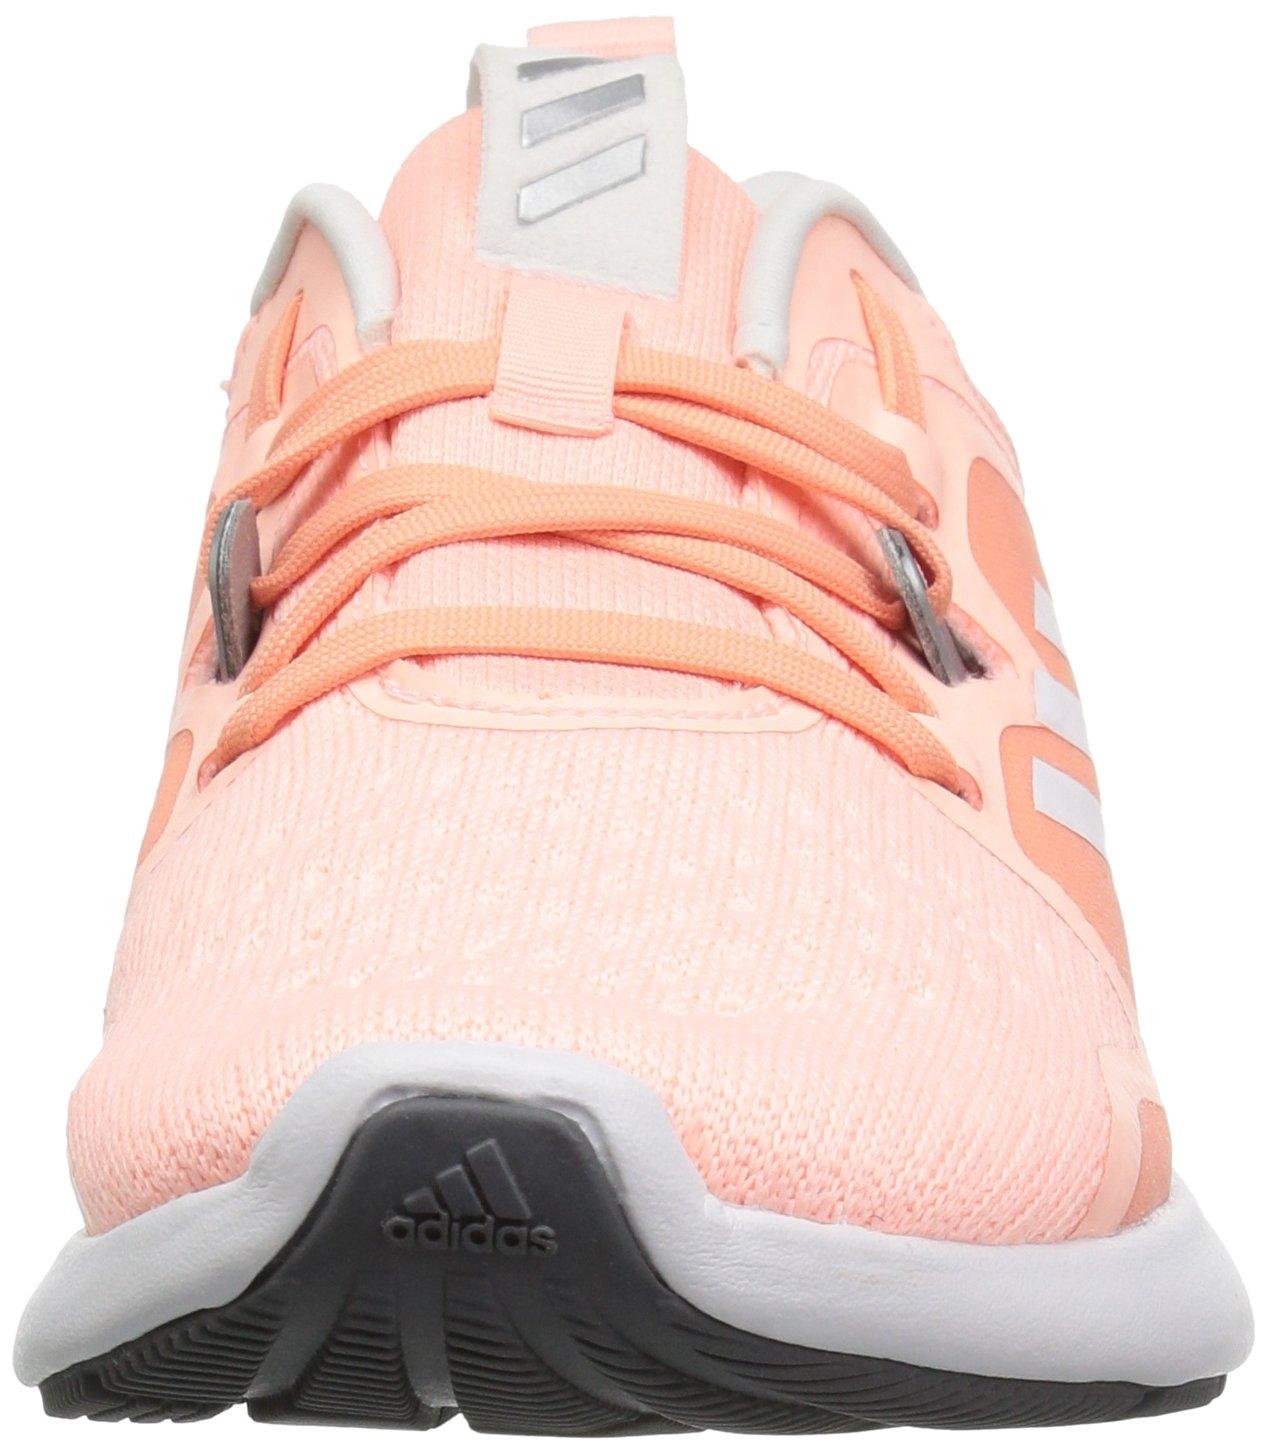 adidas Women's EdgeBounce Running Shoe Clear Orange/White/Copper Metallic 5 M US by adidas (Image #4)